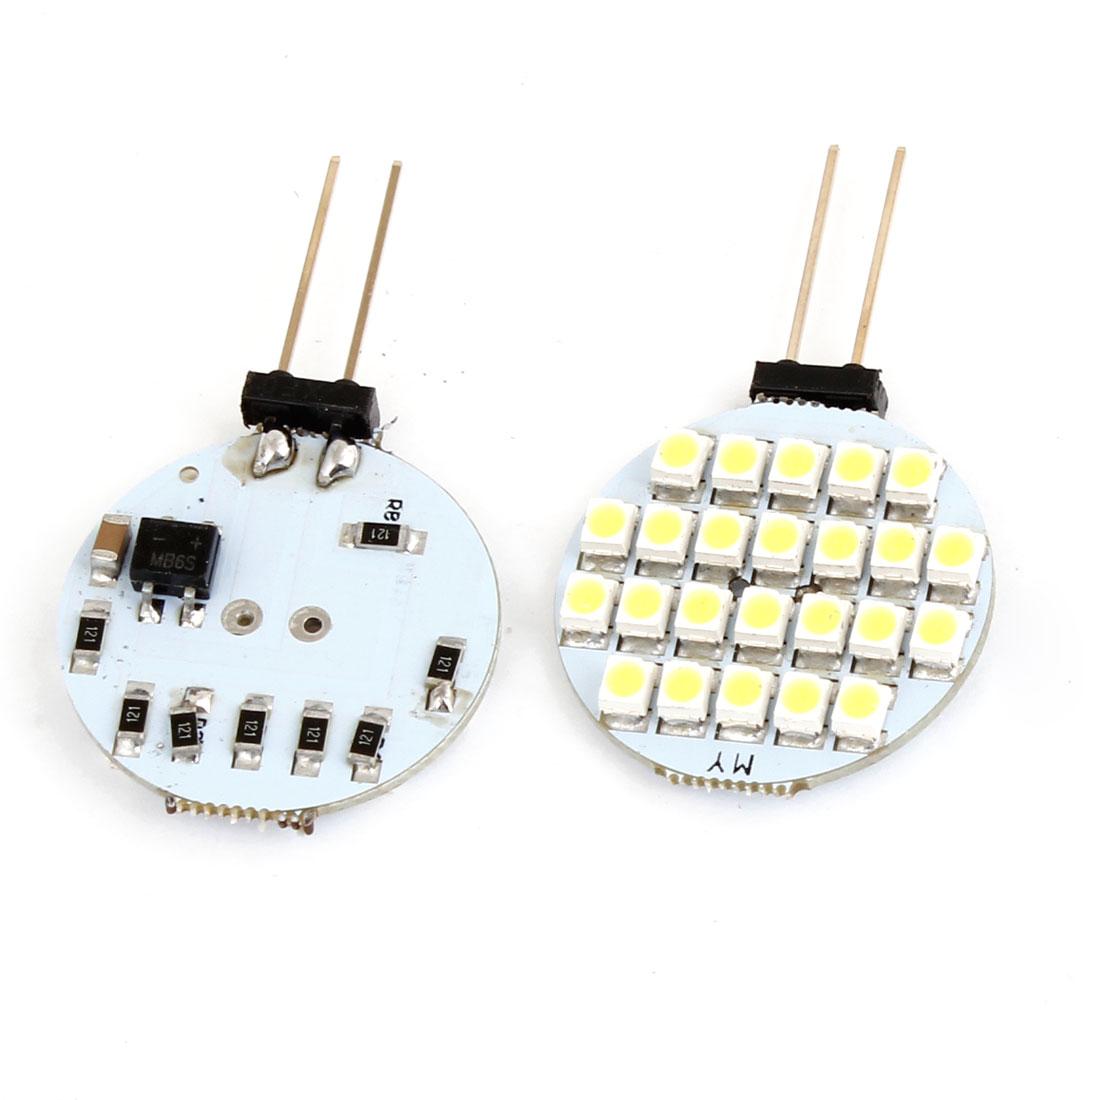 G4 4mm Pin Pitch White 1210 SMD 24-LED Car Light Lamp Bulbs 2 Pcs